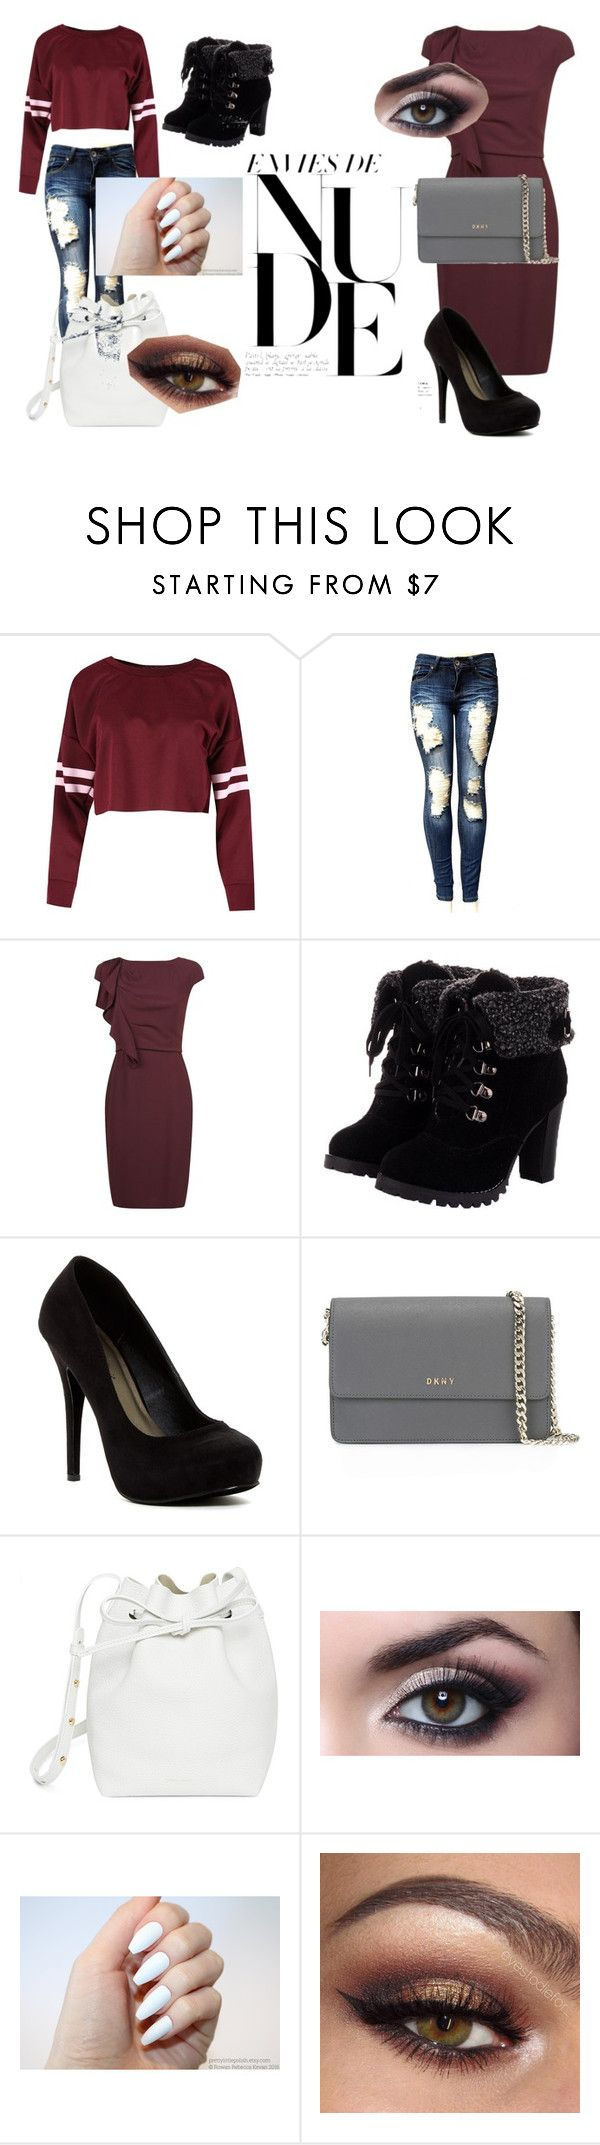 """Fashion"" by beckareka on Polyvore featuring MaxMara, Michael Antonio, DKNY, Mansur Gavriel, school, Elegant and fashionset"